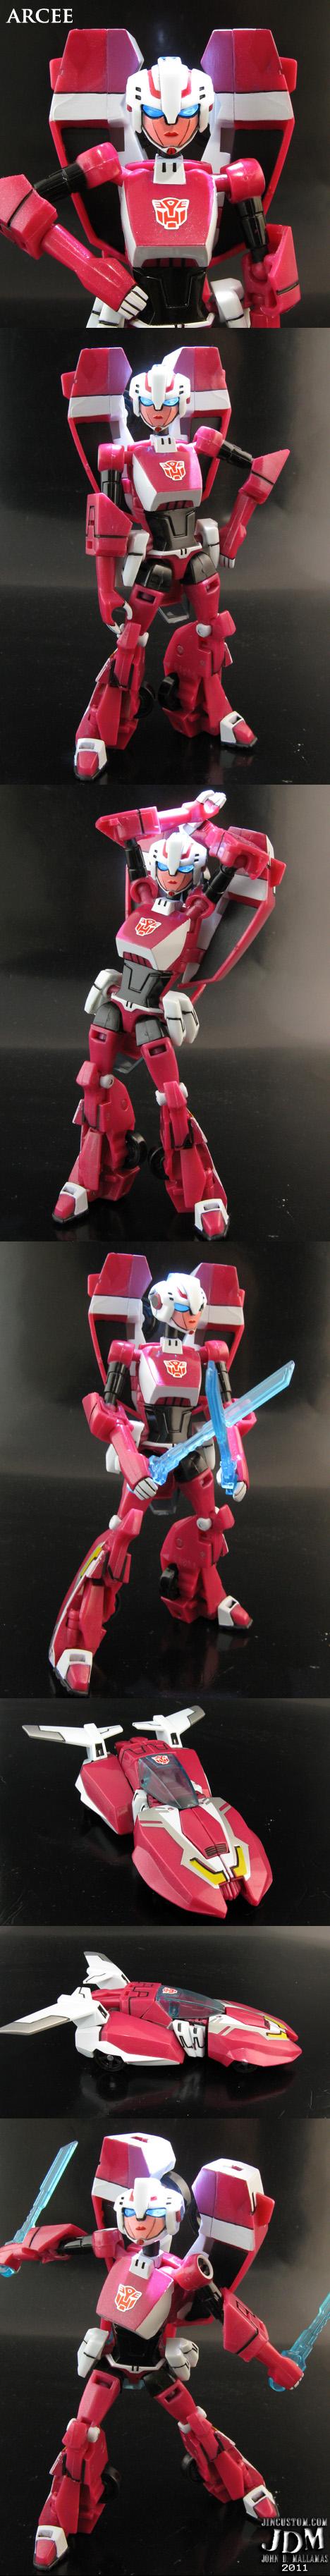 Transformers Animated Arcee